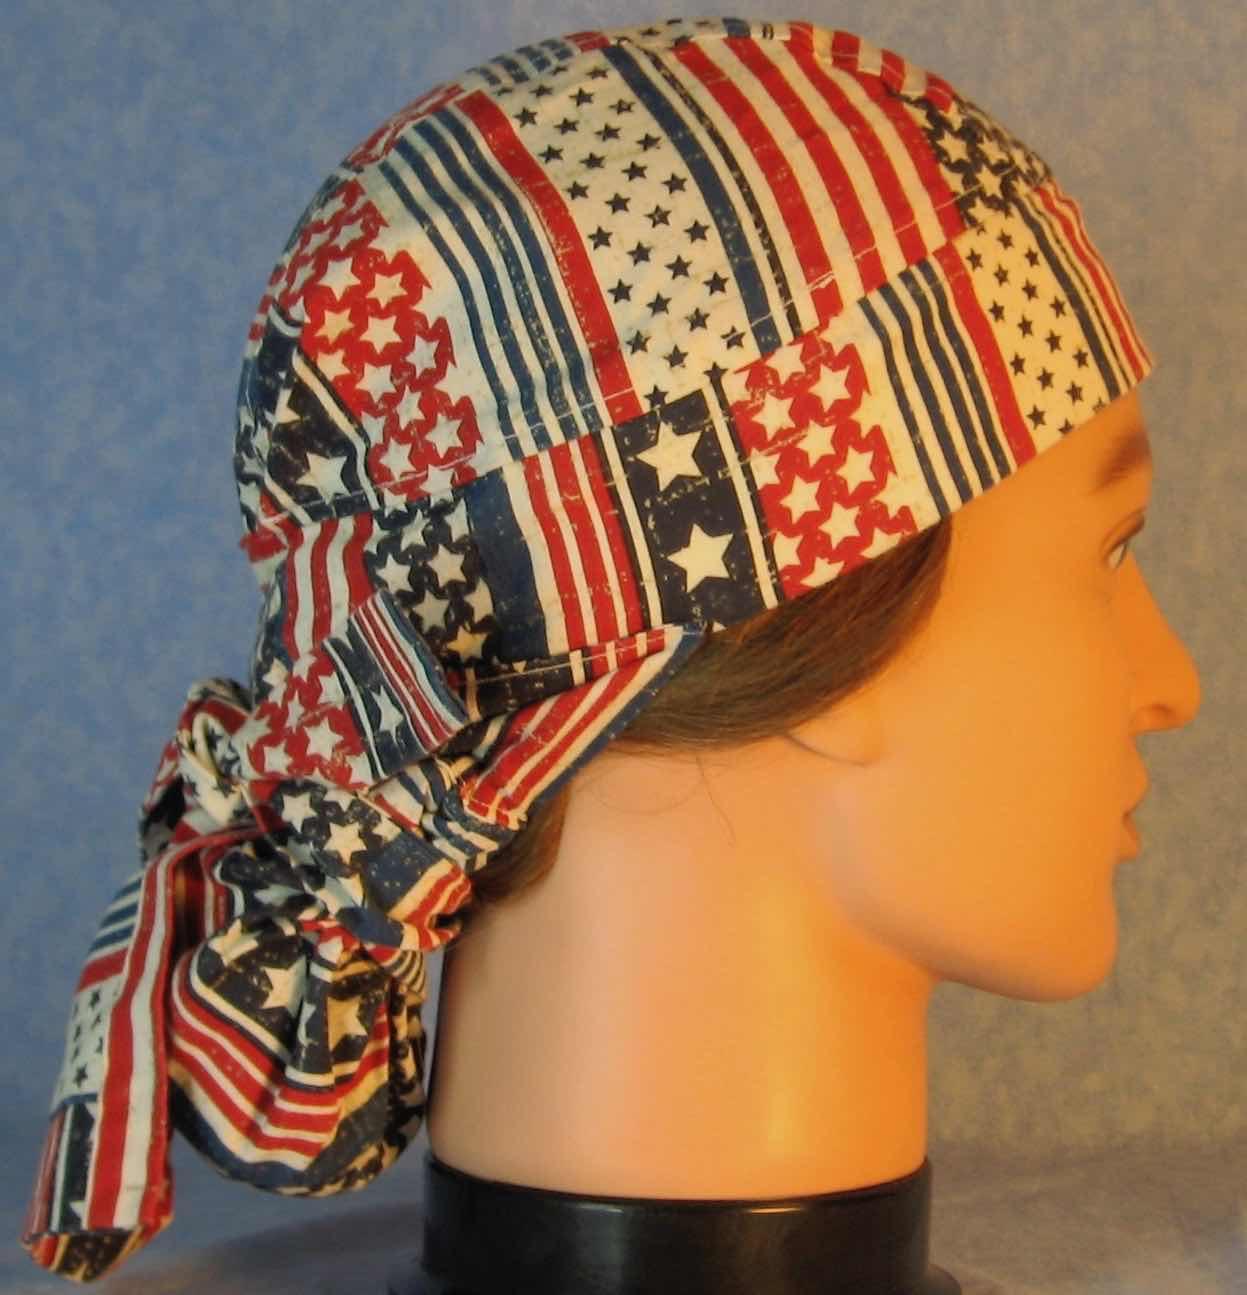 Hair Bag Do Rag in Red White Stripes White Star Blue Stripe - Adult 1XL-3XL